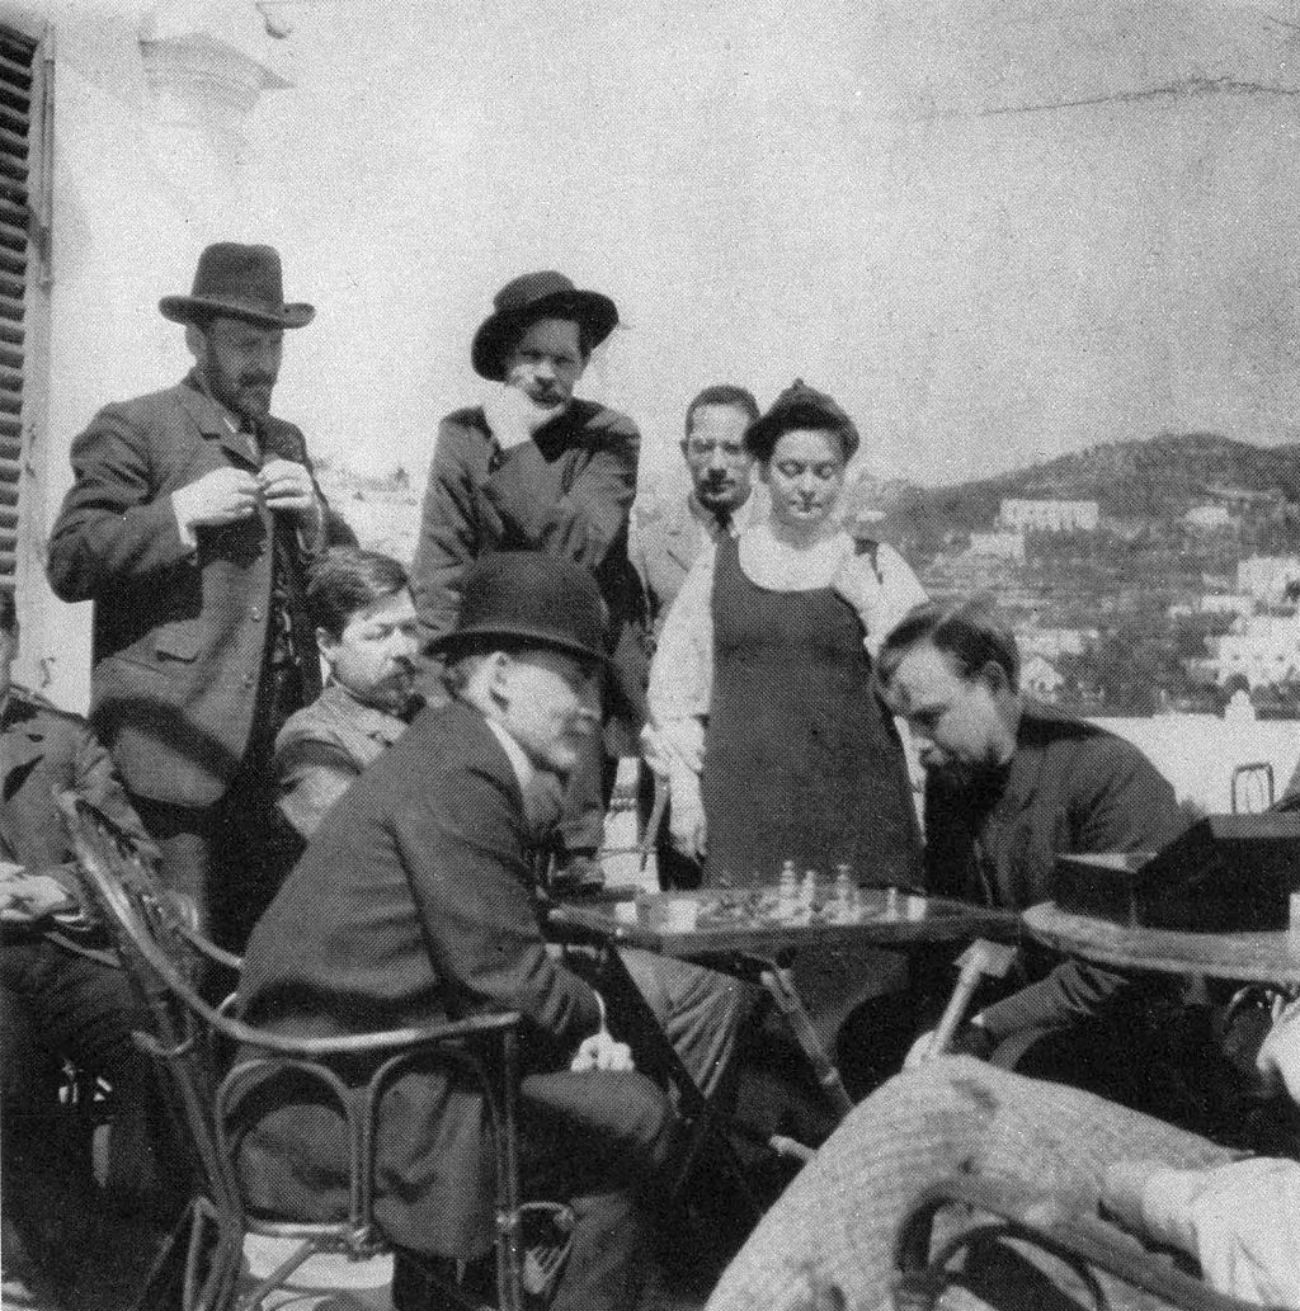 Vladimir Lenin plays chess with Alexander Bogdanov, 1908, Capri. Zinovy Peshkov is the second from the right in the top row, next to him is Maxim Gorky.